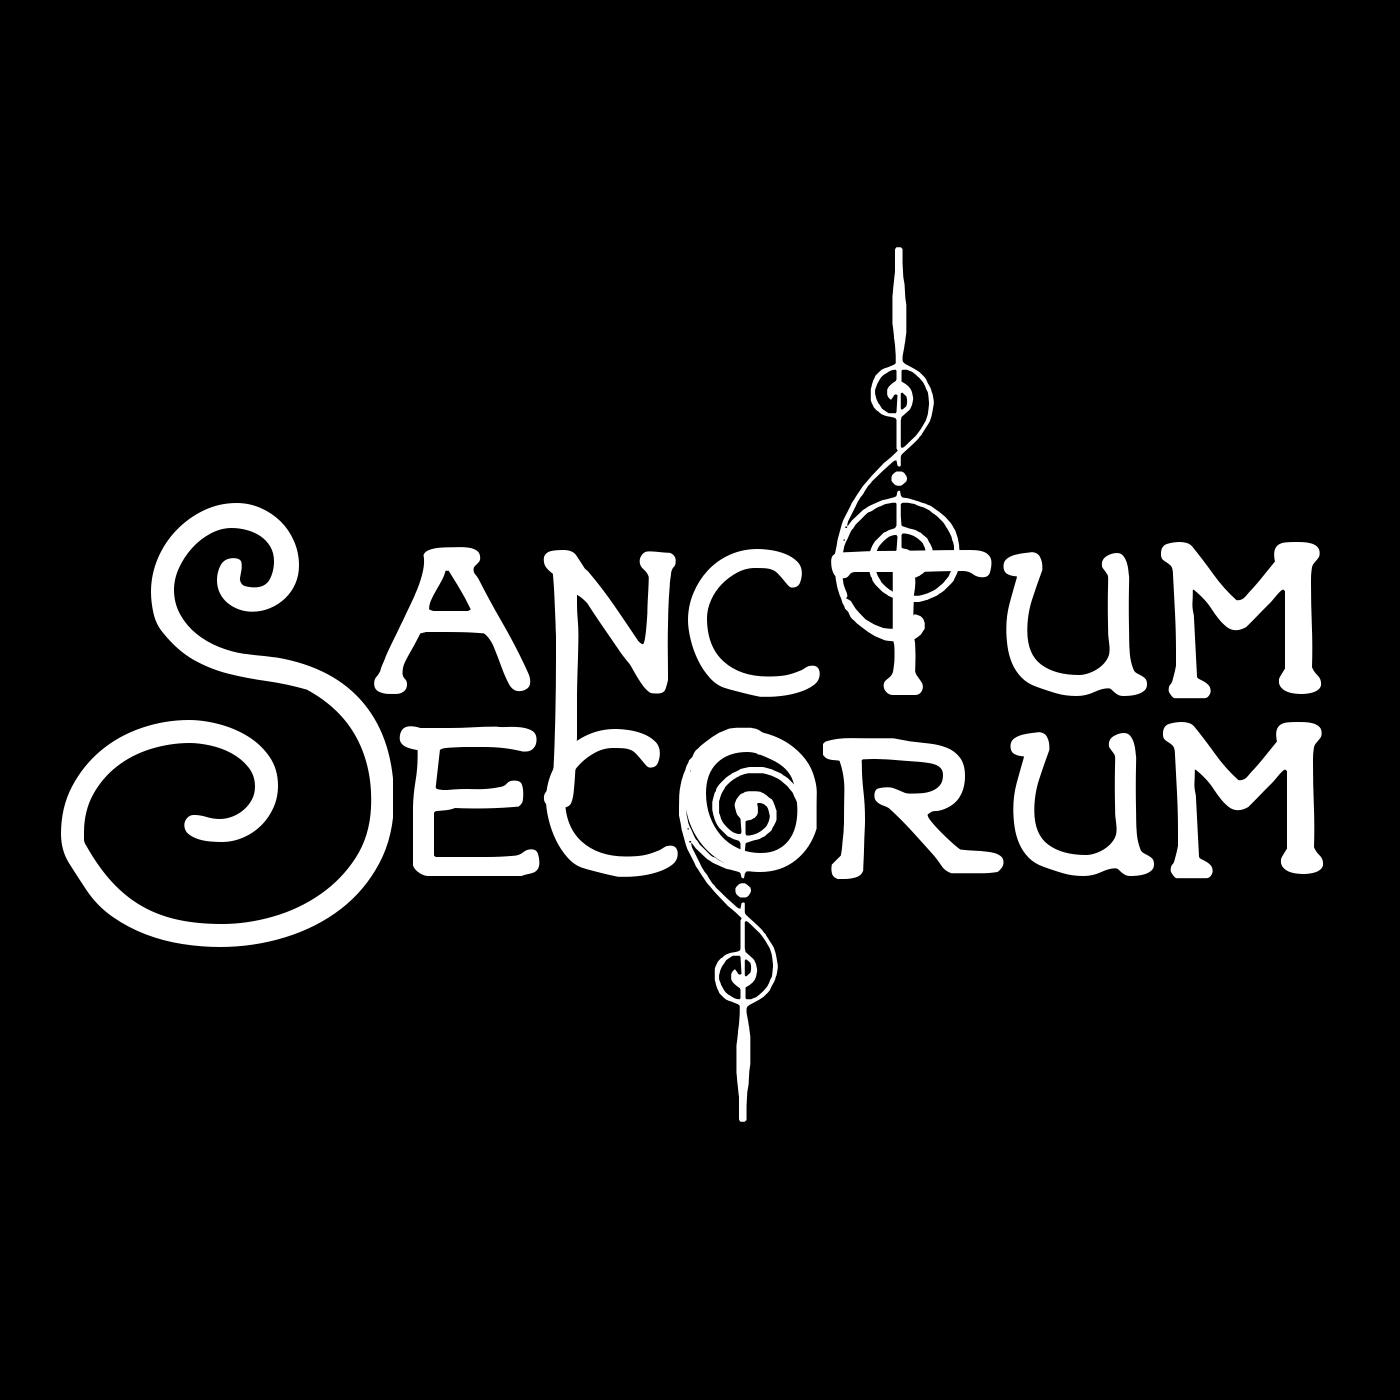 Sanctum Secorum #05 - Song of Sorcery